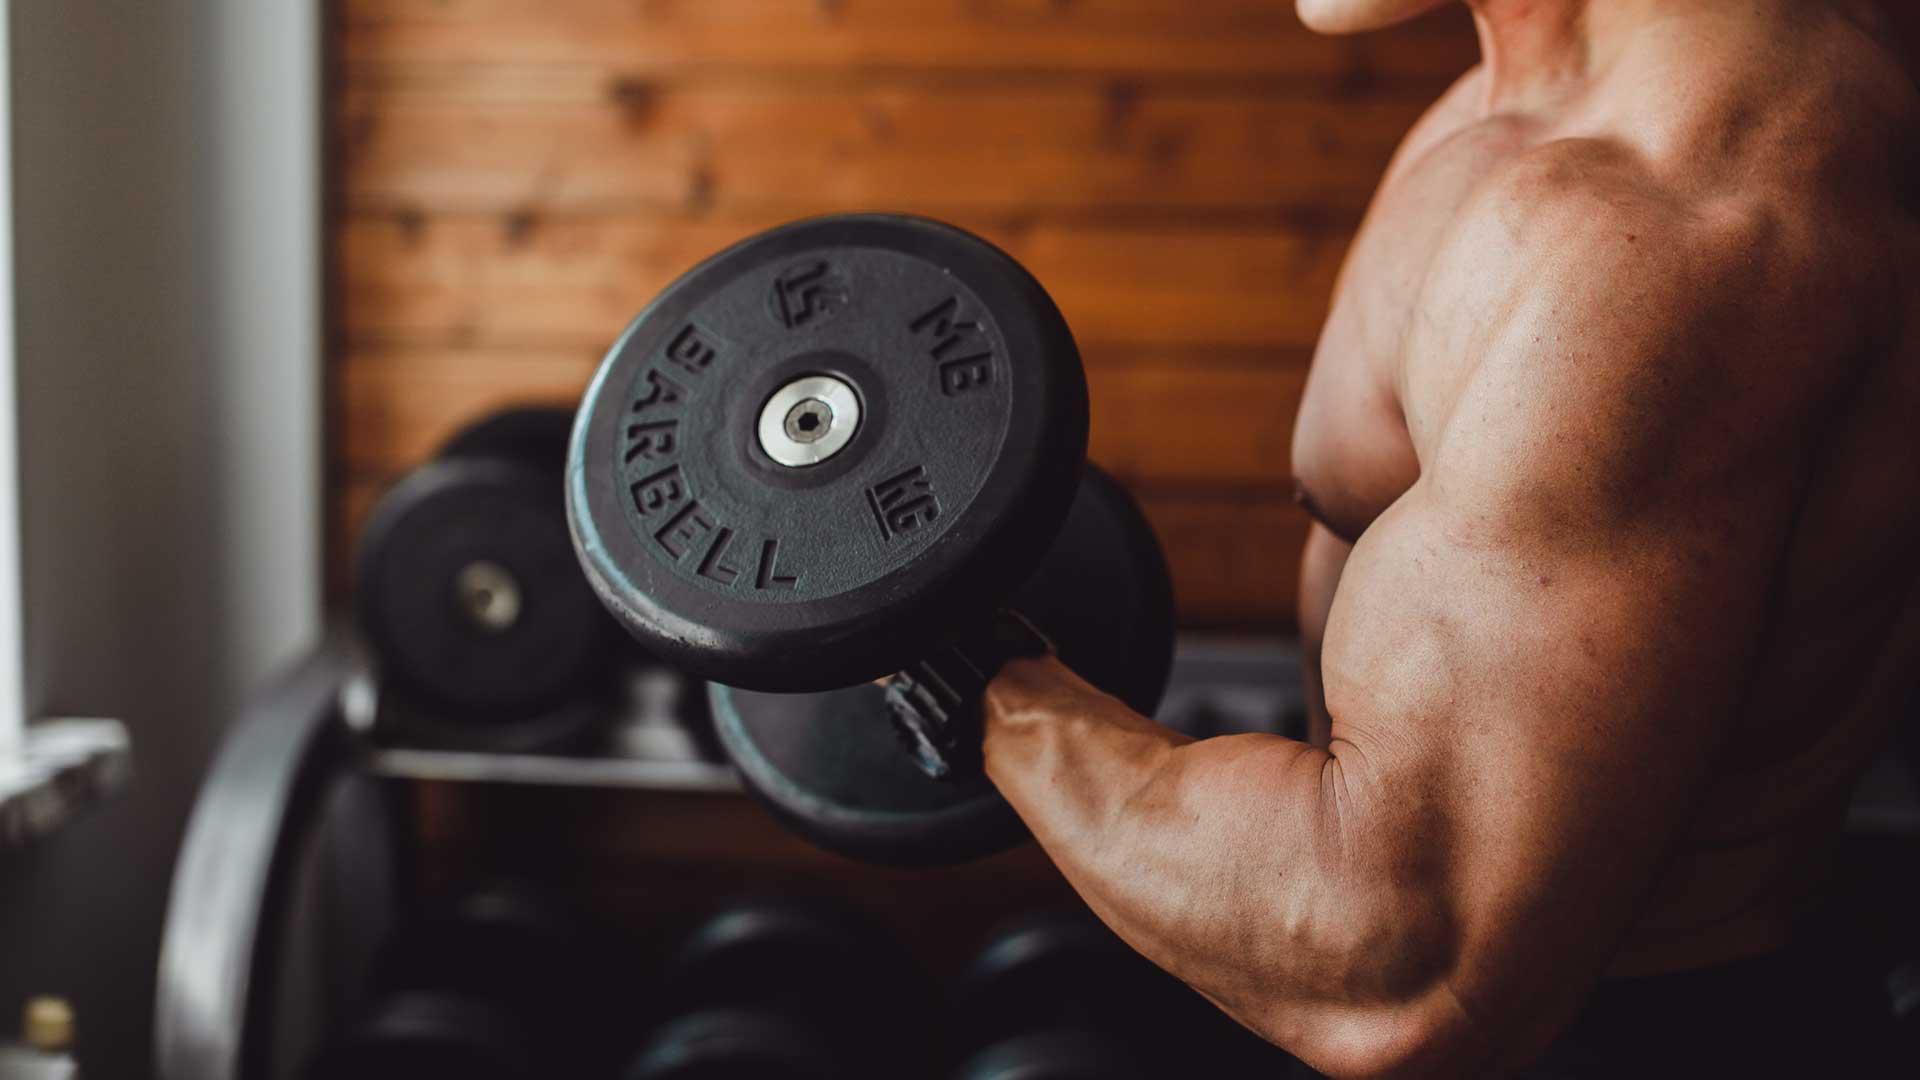 eetschema fitness spiermassa